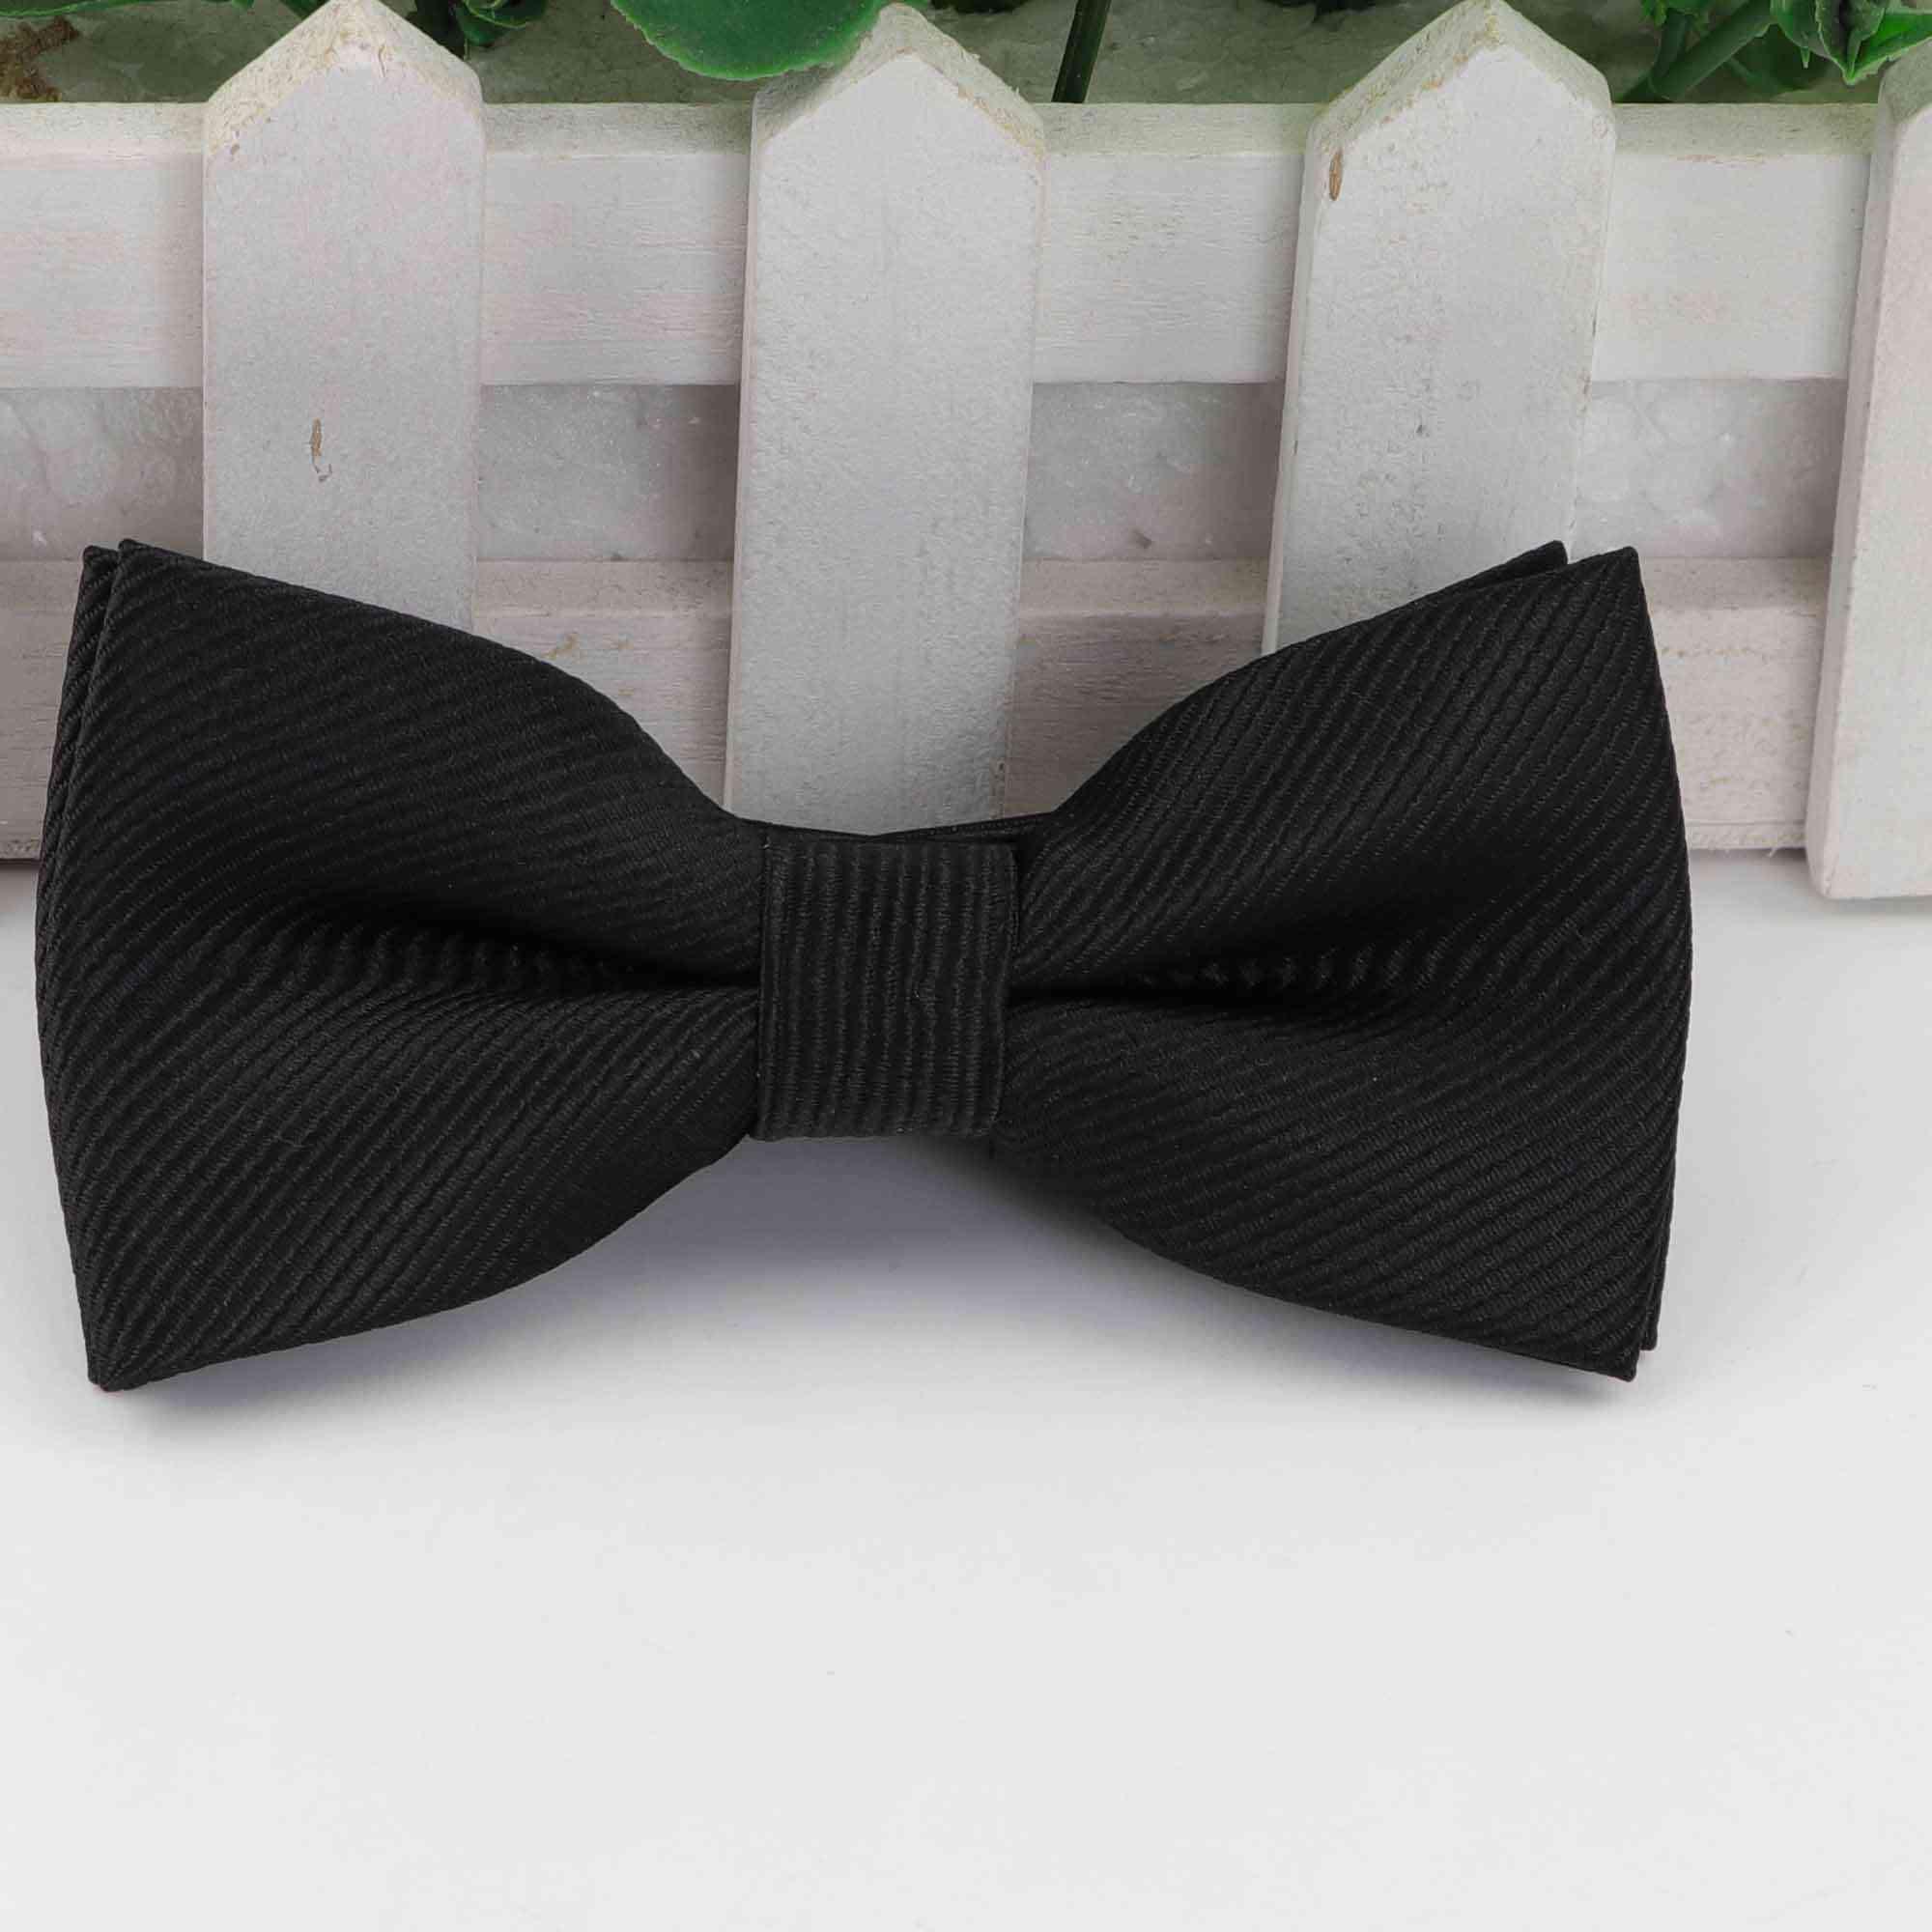 Matt Classic Tuxedo Bow Ties Pet Dog & Cat Neck Tie For Boy & Girl